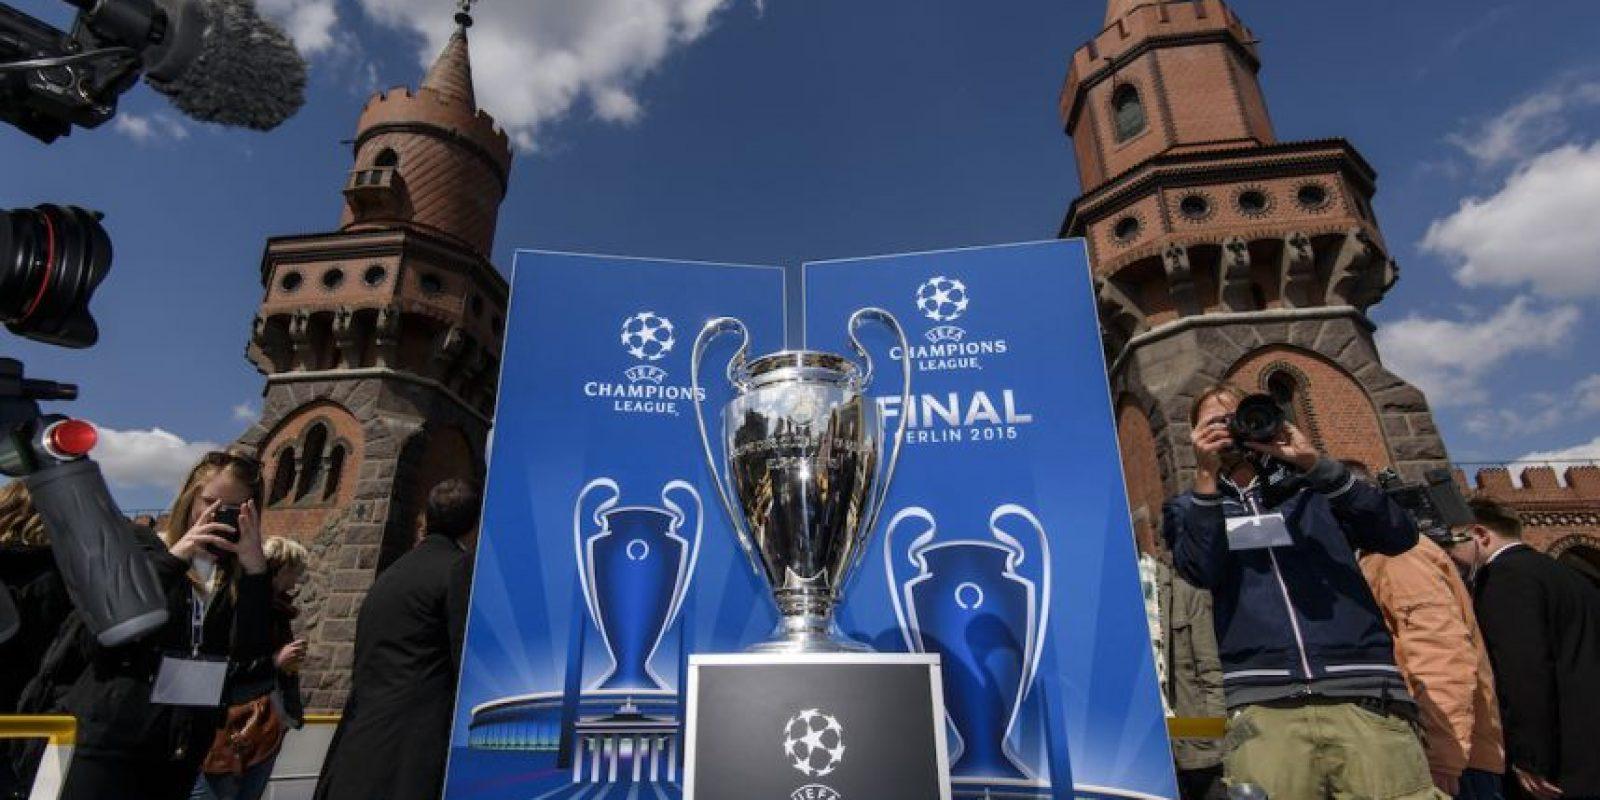 17 boletos para la final de la Champions League en Berlín. Foto:Getty Images